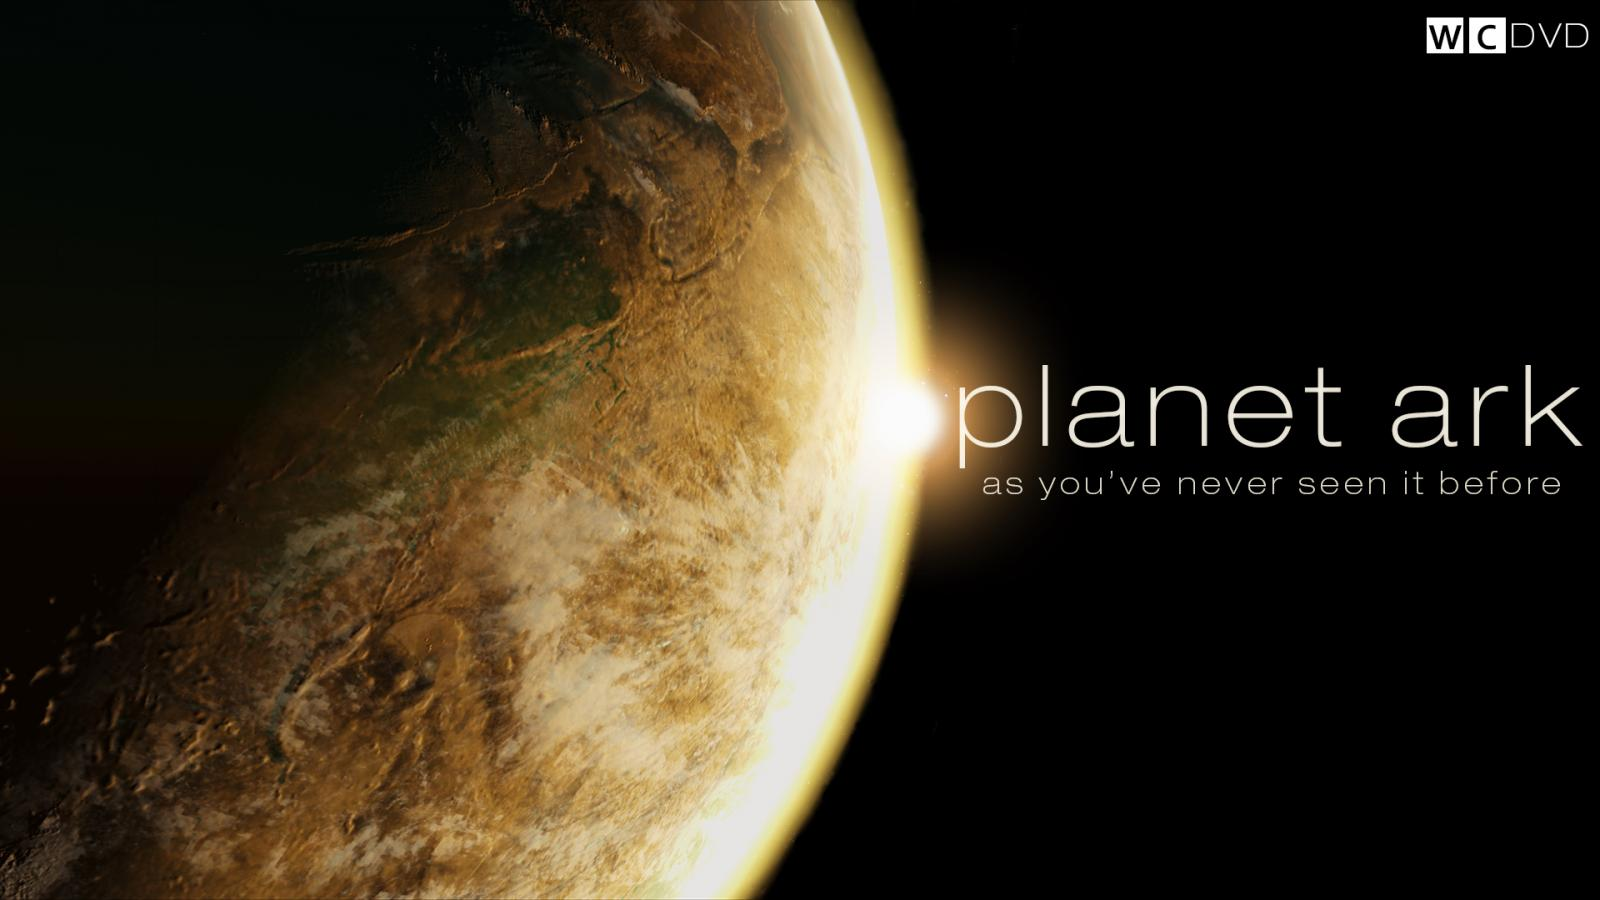 large.5a596e1ca90c7_BlueDragon-PlanetARK-Freeform.jpg